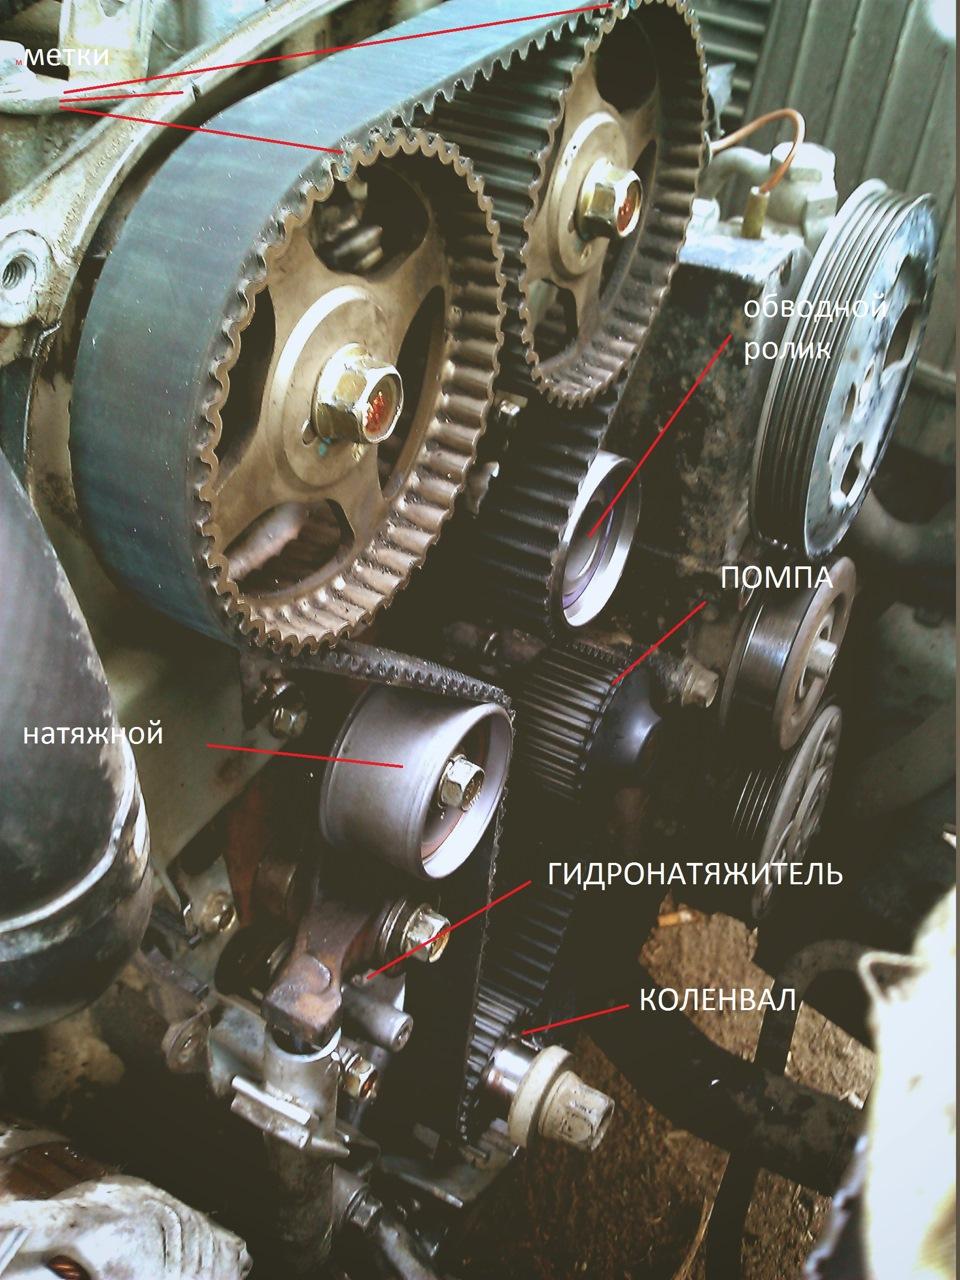 Дворовая замена ремня ГРМ. - logbook Mitsubishi Pajero iO 1.8 GDI little brother 2000 on DRIVE2